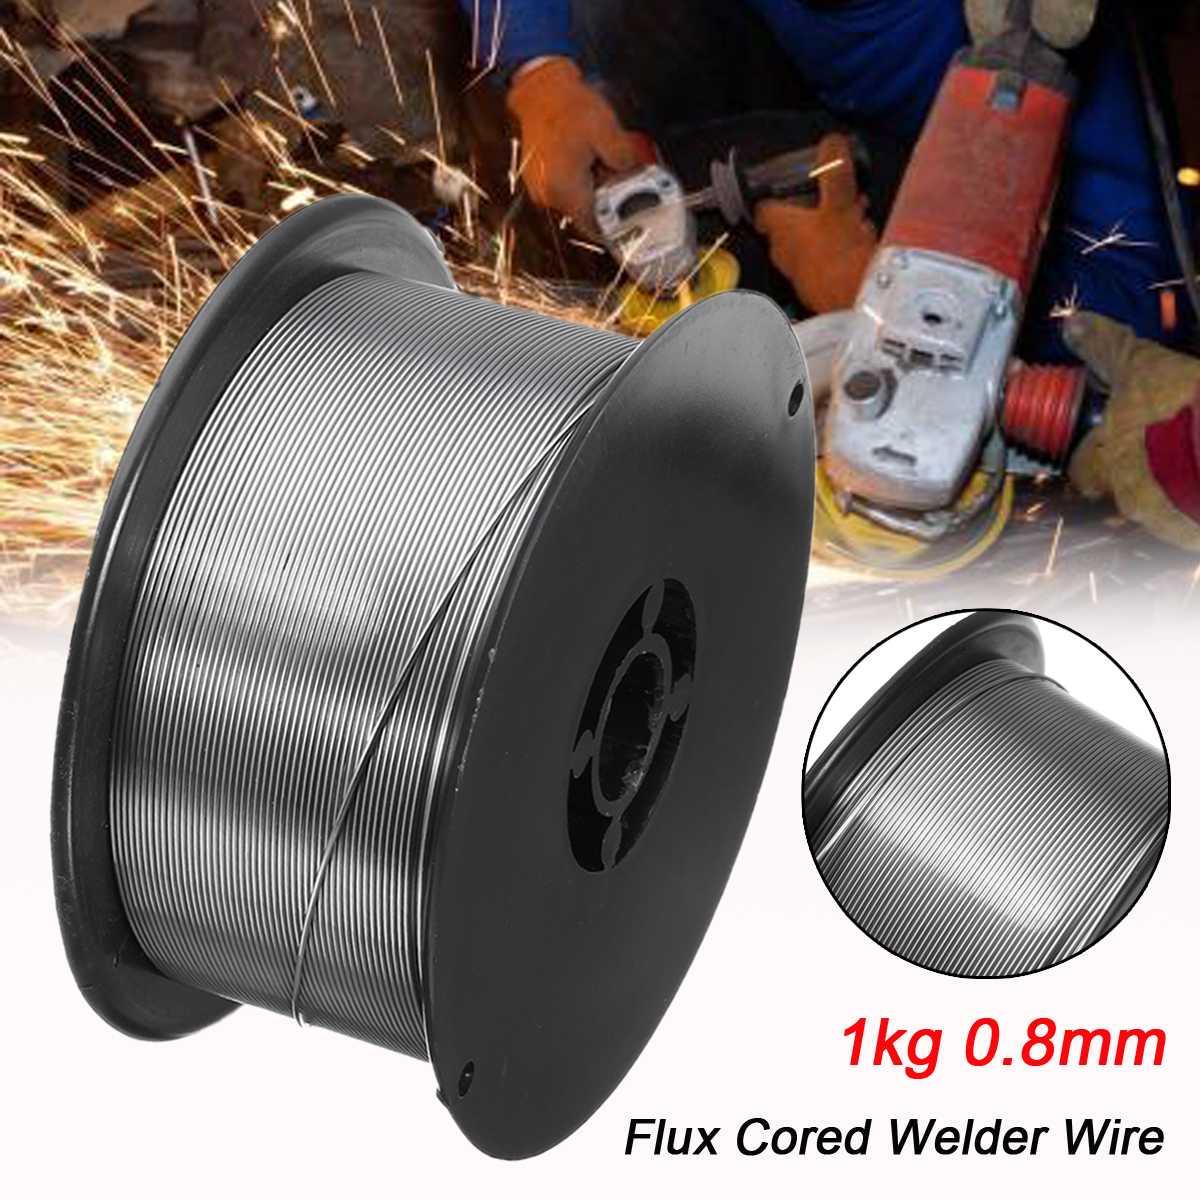 Gasless Mig Welding Wire E71T-GS / E71T-11 1kg 0.8mm Flux Core for Welder Wire Steel Flux Cored Welding Wire without gasGasless Mig Welding Wire E71T-GS / E71T-11 1kg 0.8mm Flux Core for Welder Wire Steel Flux Cored Welding Wire without gas